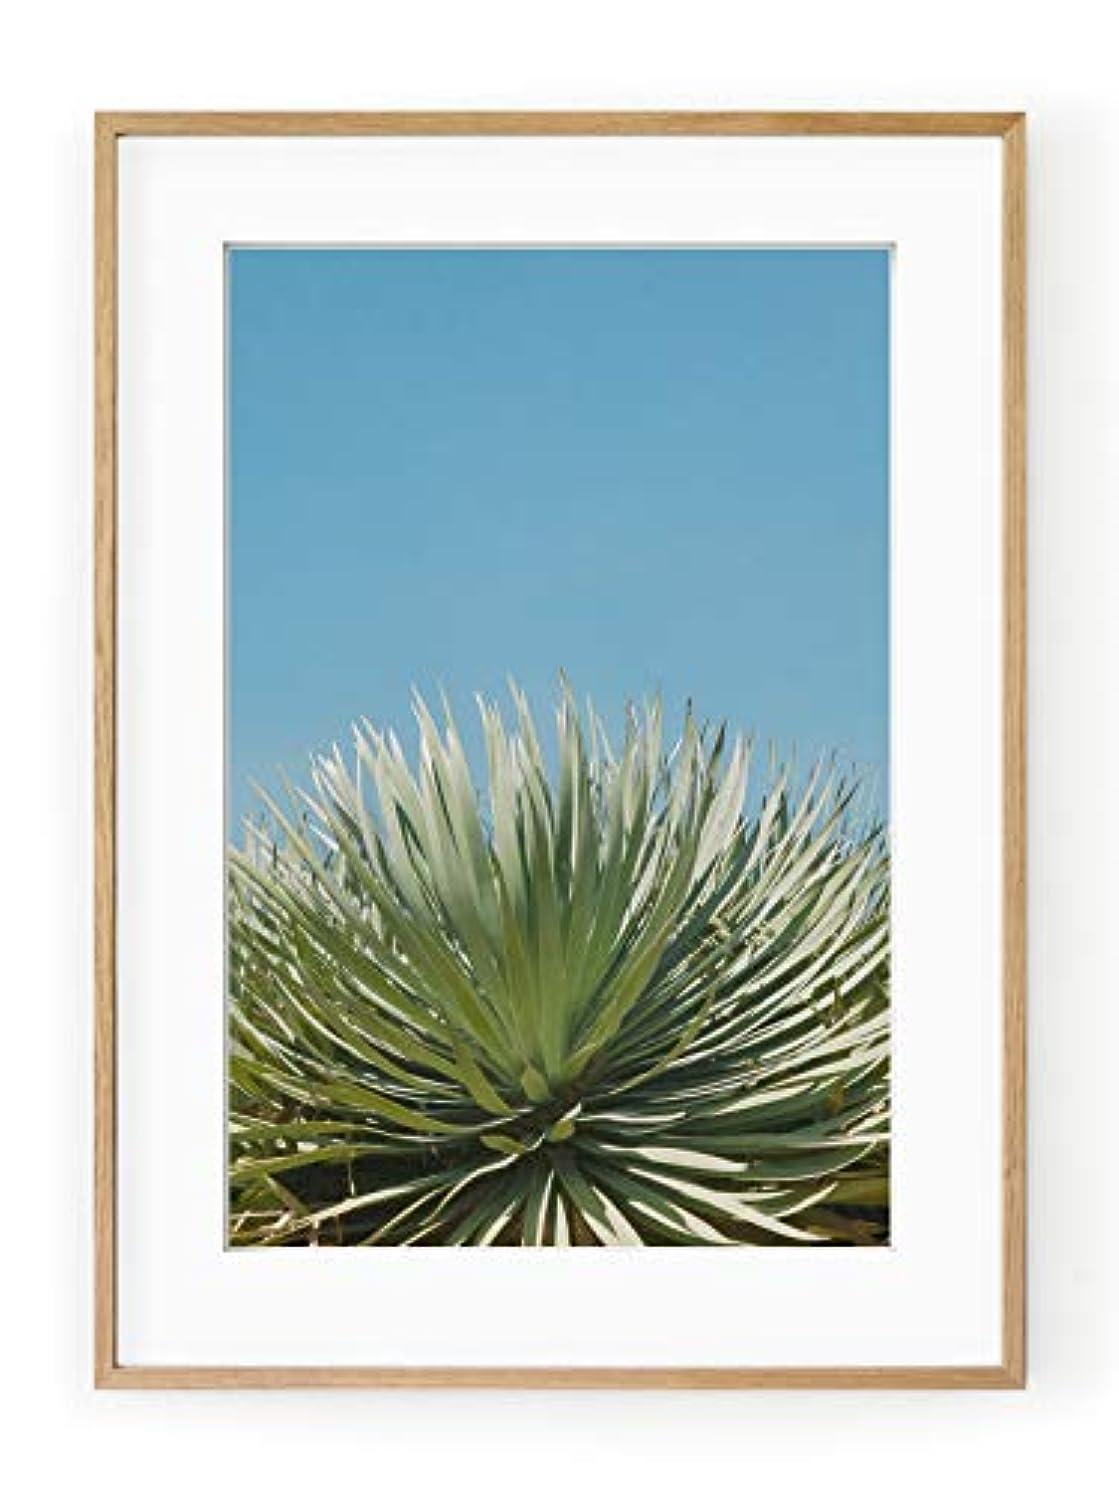 Colors of Senegal 3 Satin Black Aluminium Frame with Mount, Multicolored, 30x40